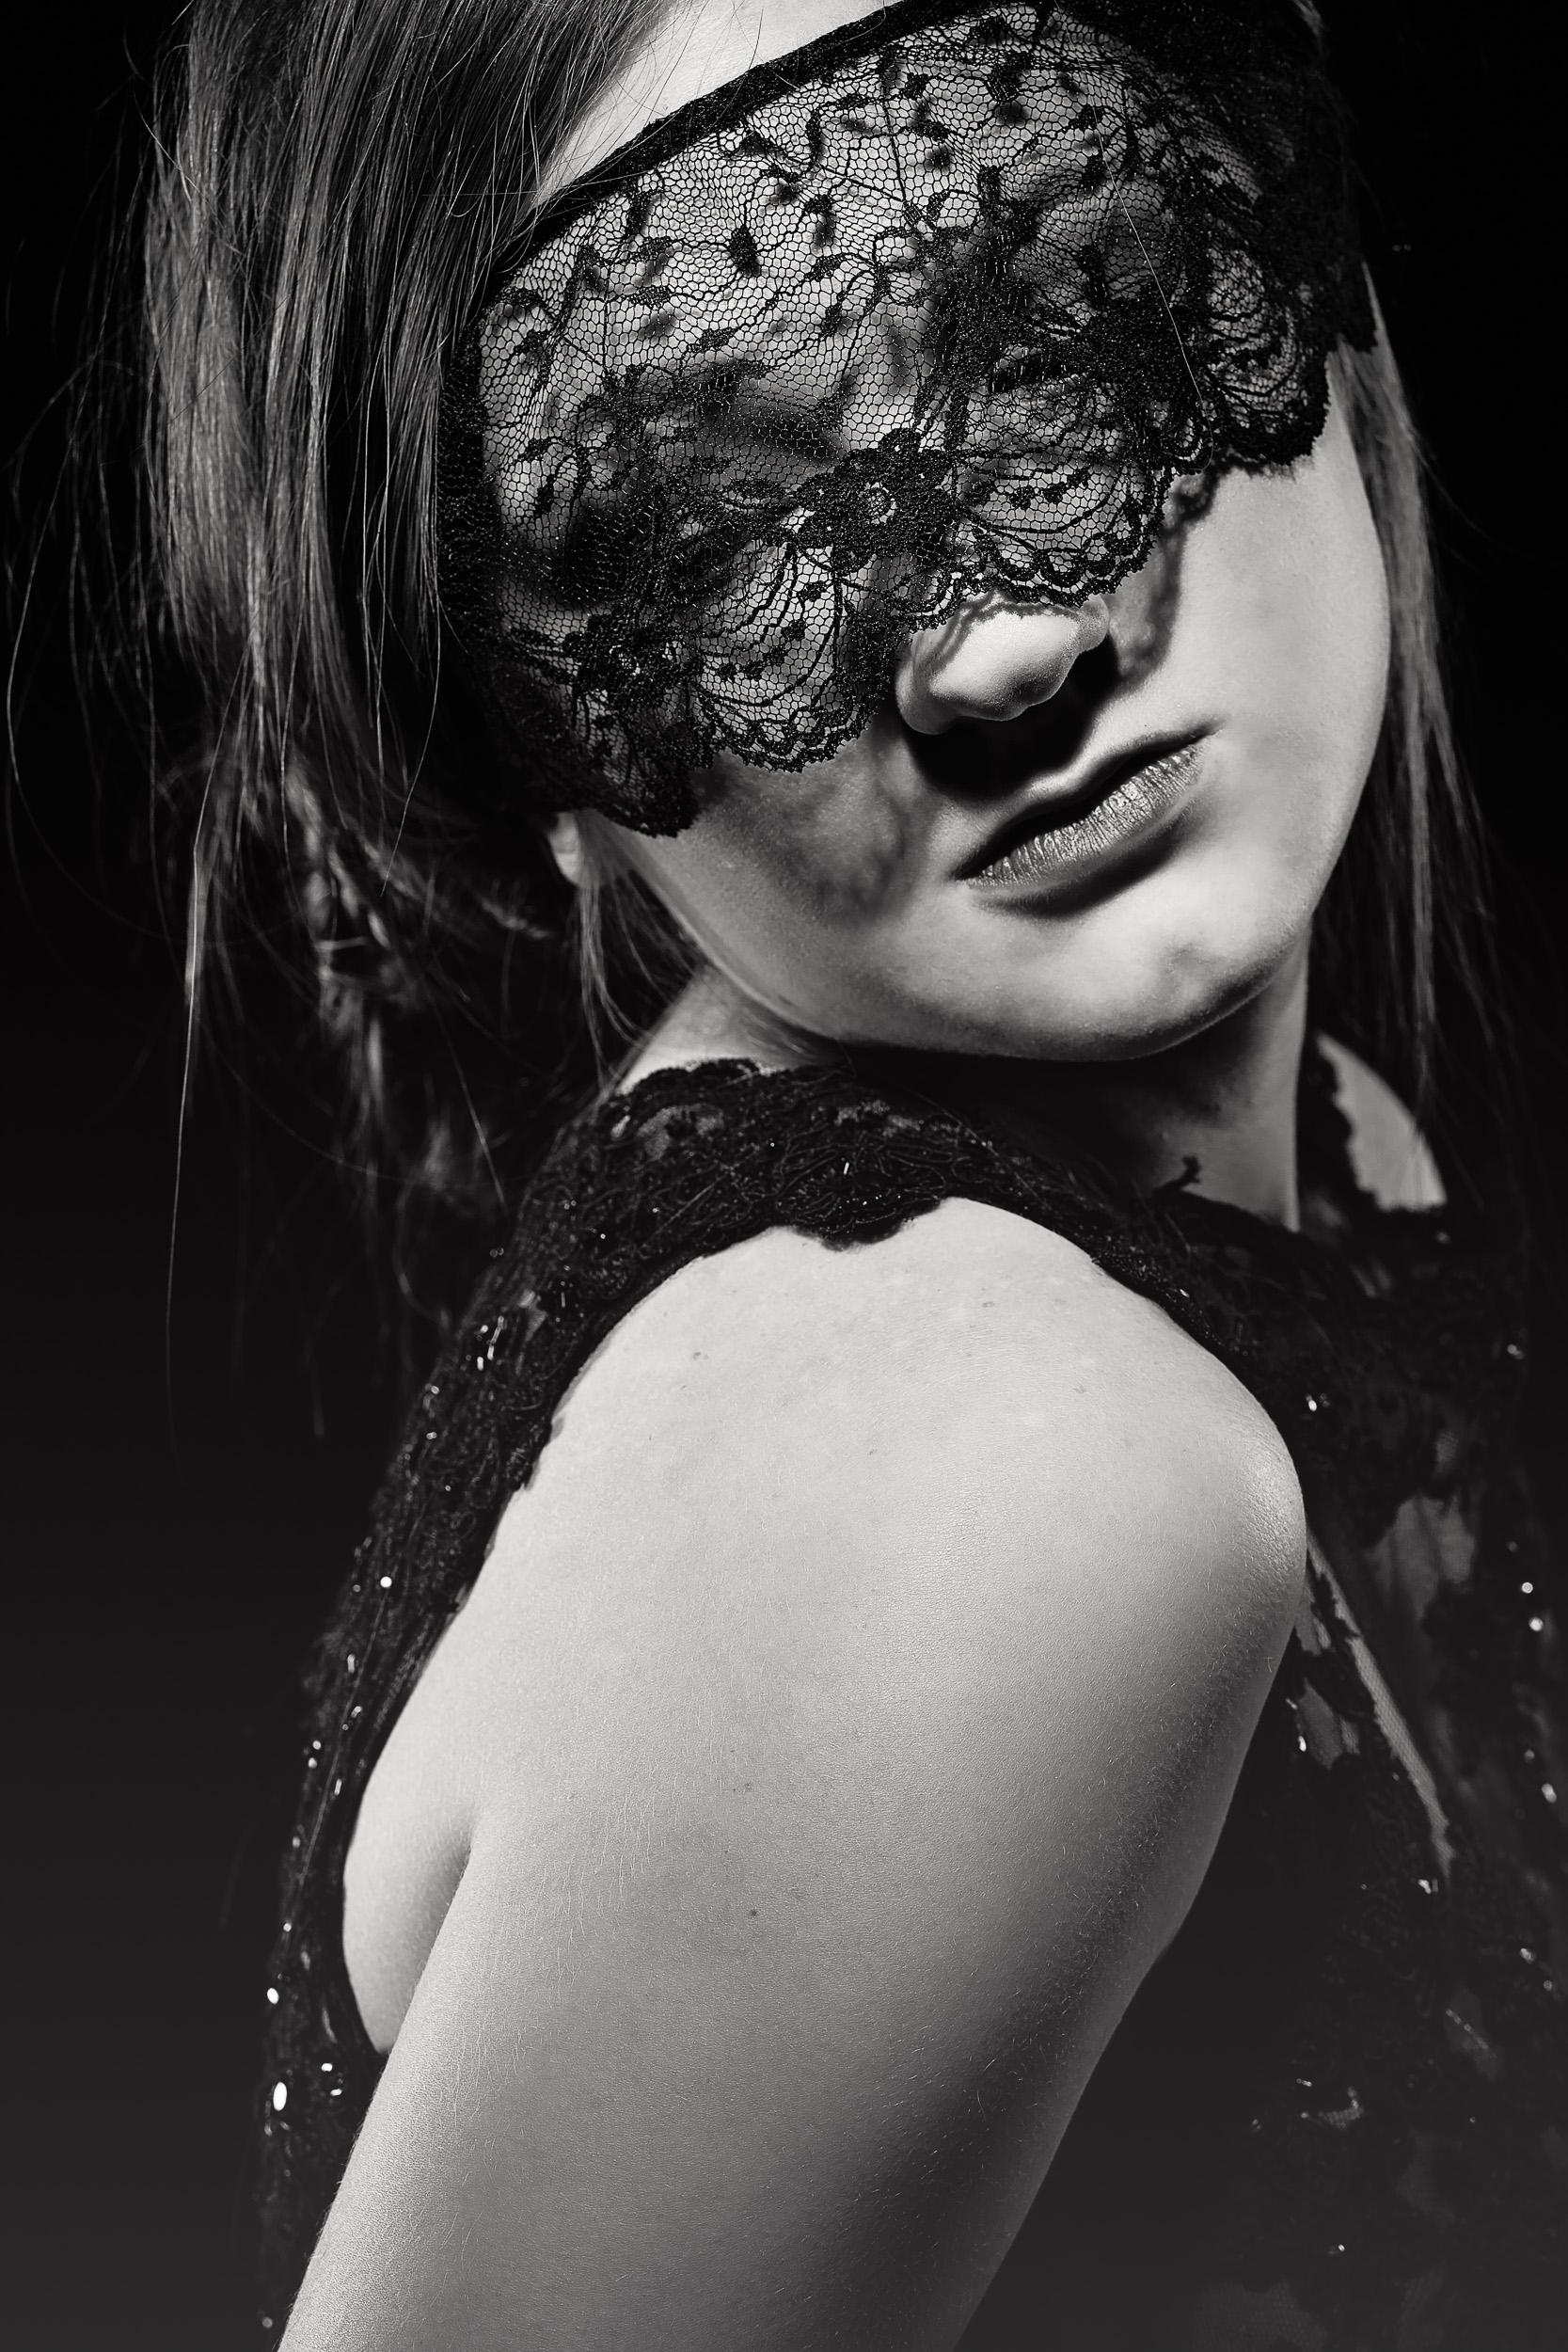 JenniferDworekPhotography_Black&White3-2.jpg